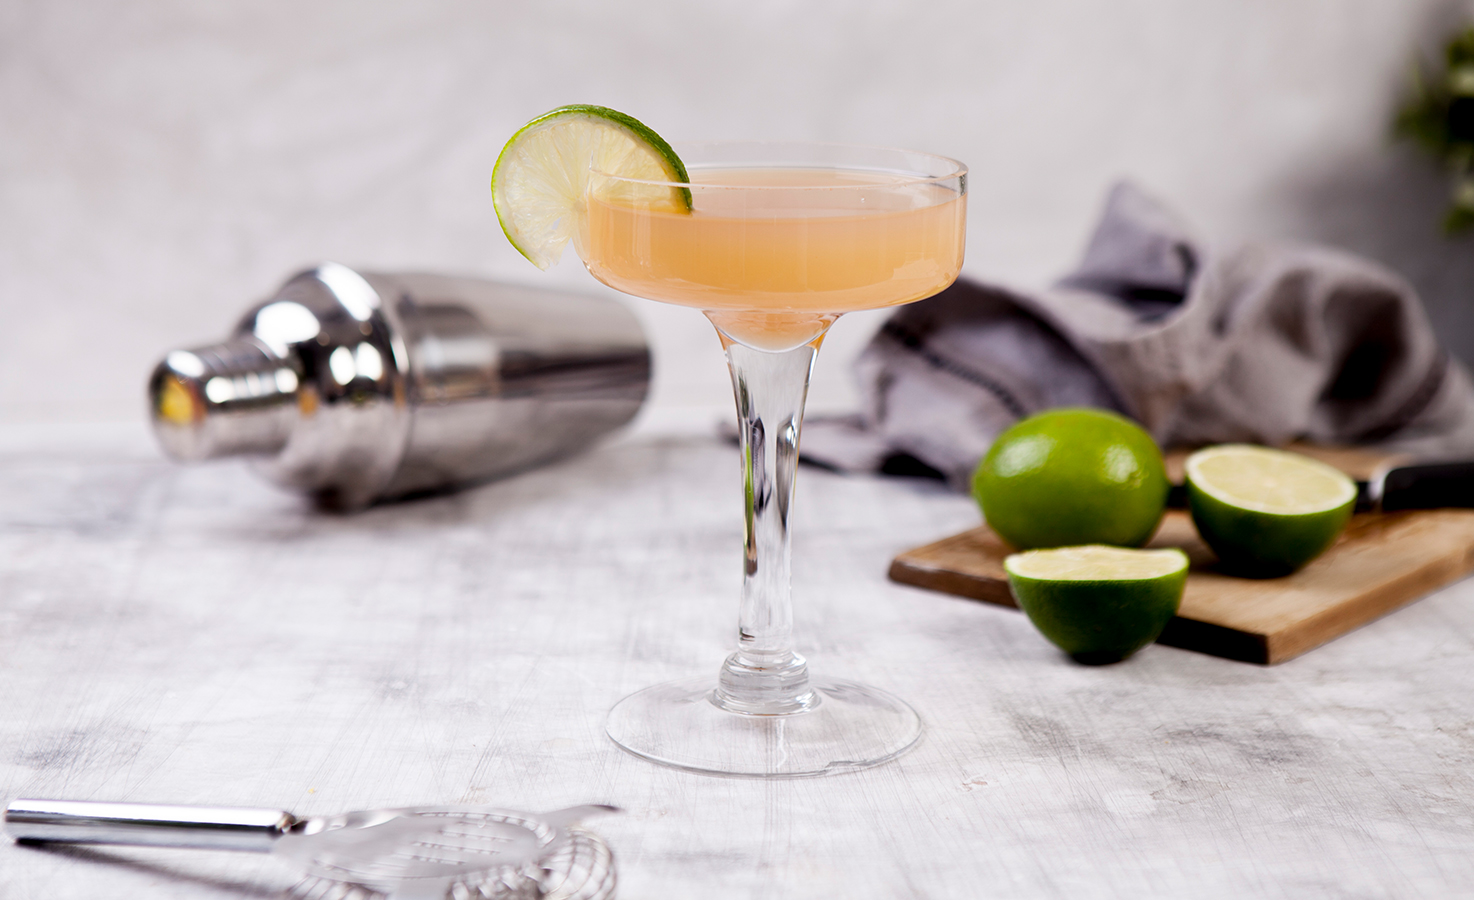 002_Bonpland-Rum-Blanc-VSOP-DaiquiriMx5wihup6ssbb